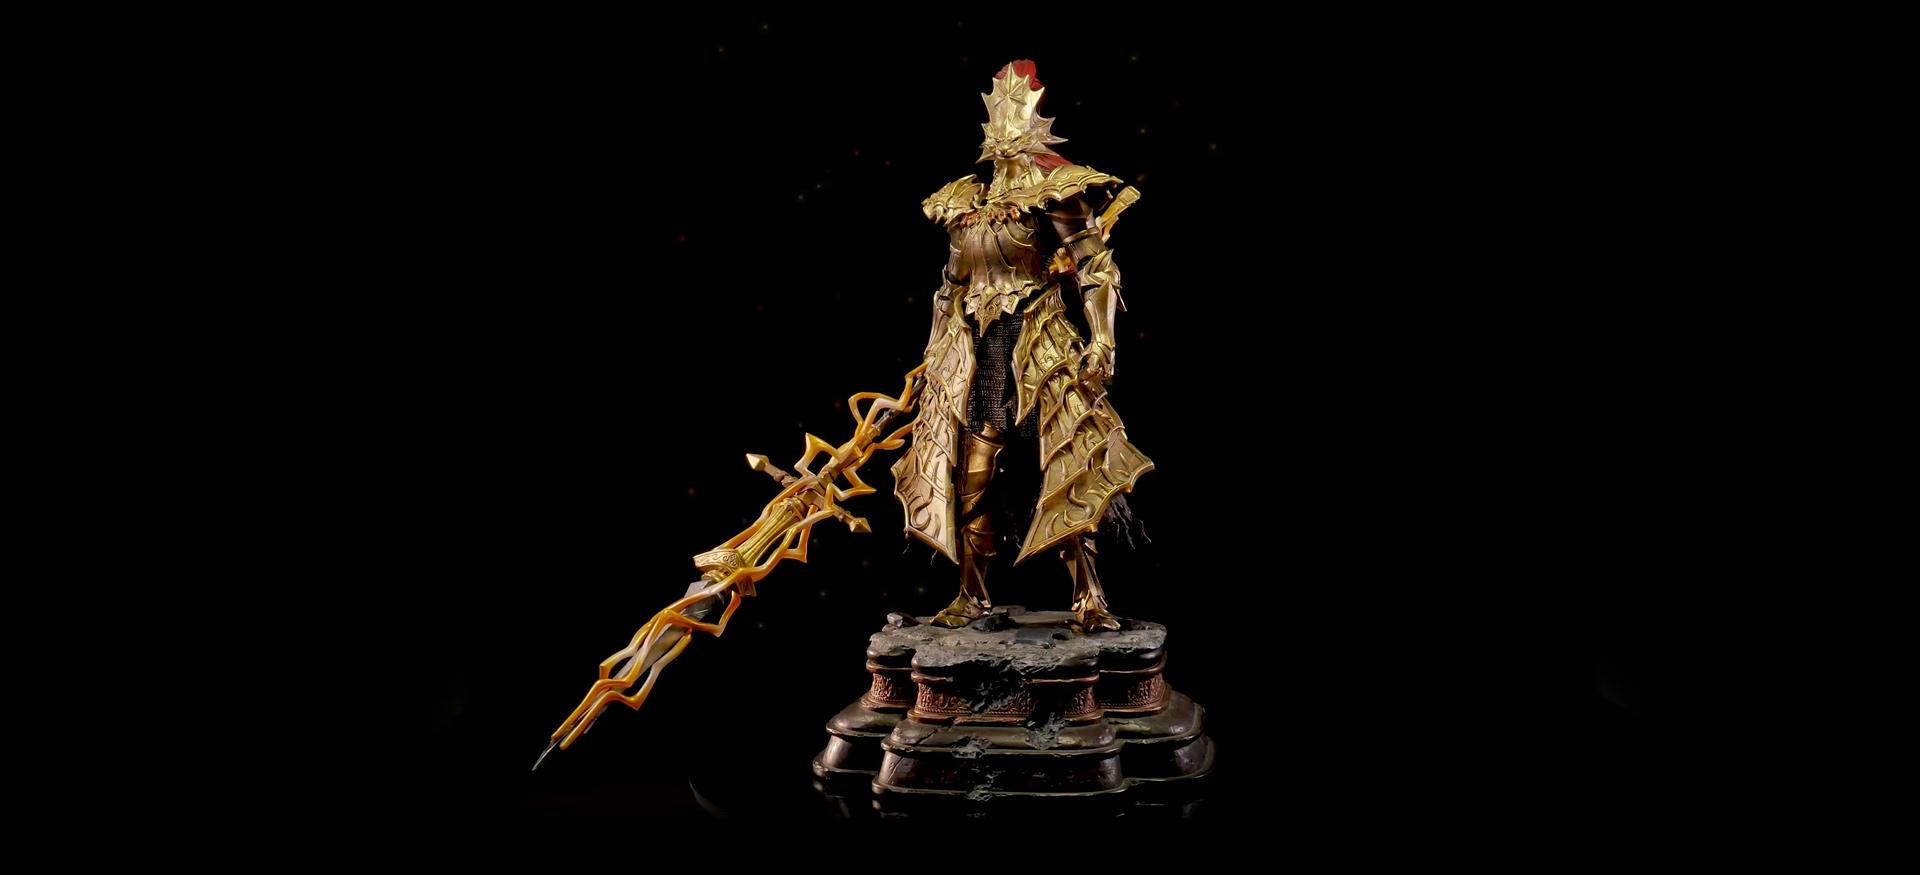 Dark Souls' Dragon Slayer Ornstein makes for an imposing statue screenshot